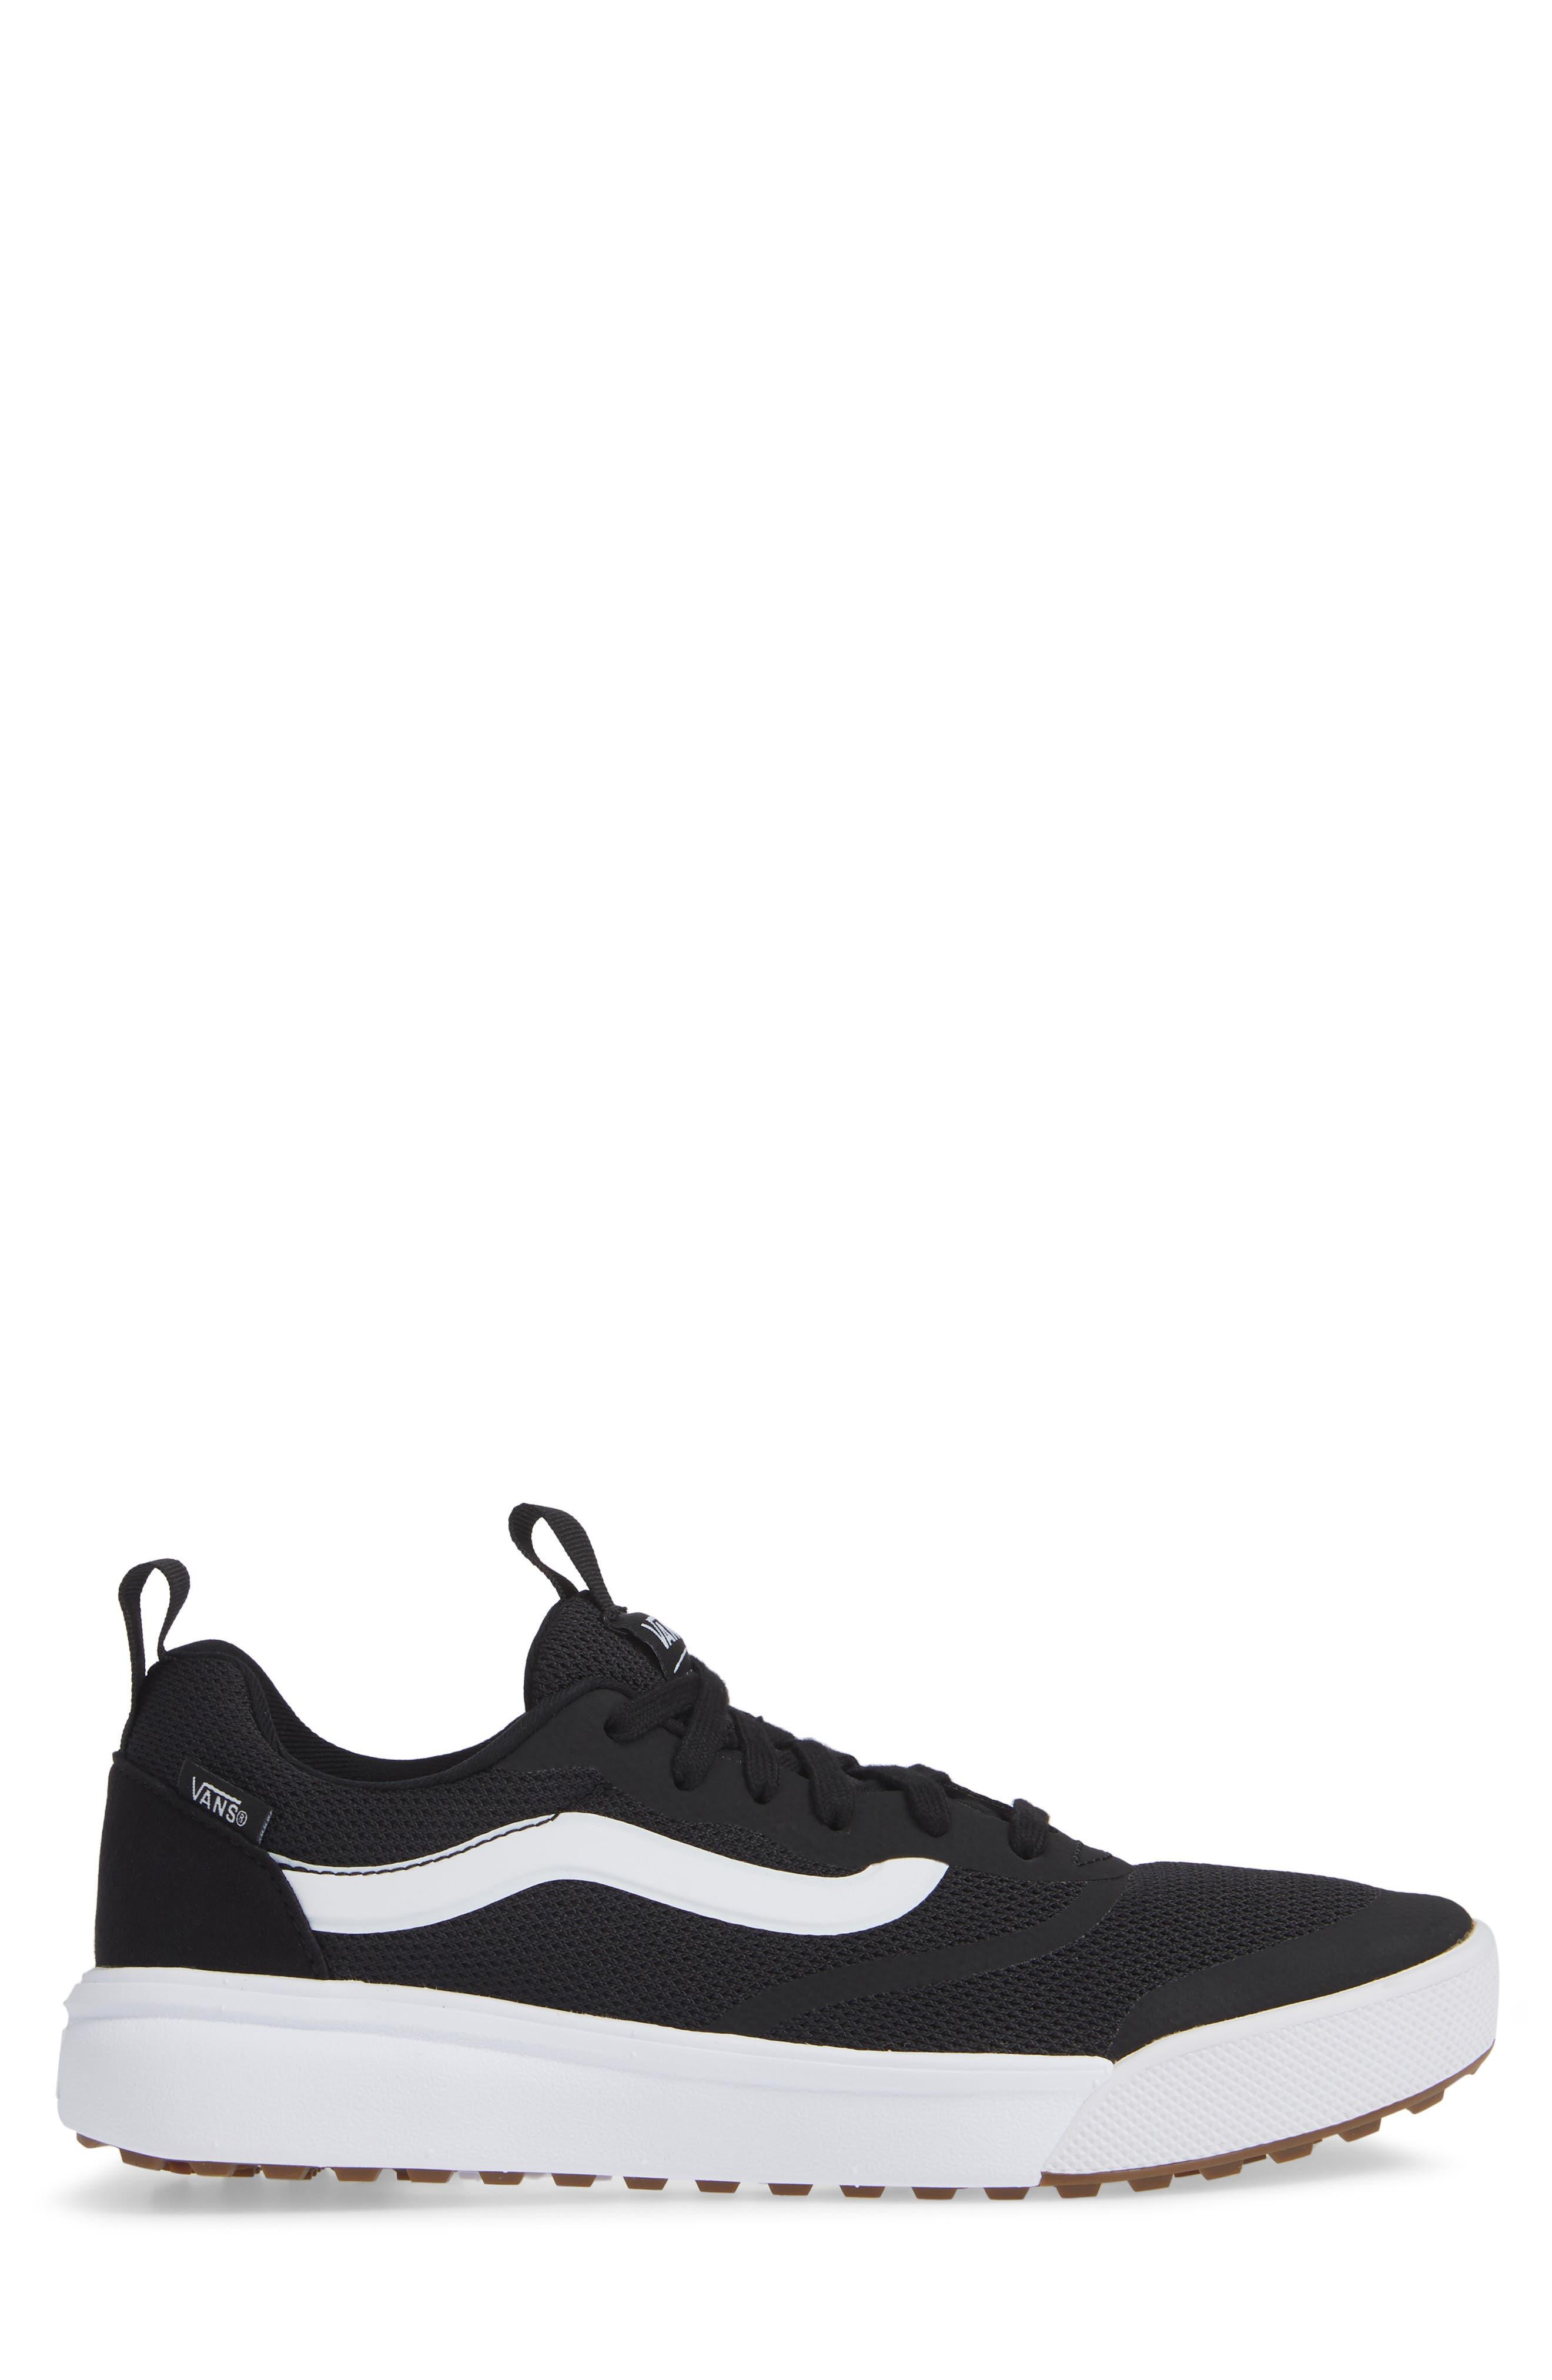 Ultrarange Rapidwield Sneaker,                             Alternate thumbnail 3, color,                             BLACK/ WHITE MESH